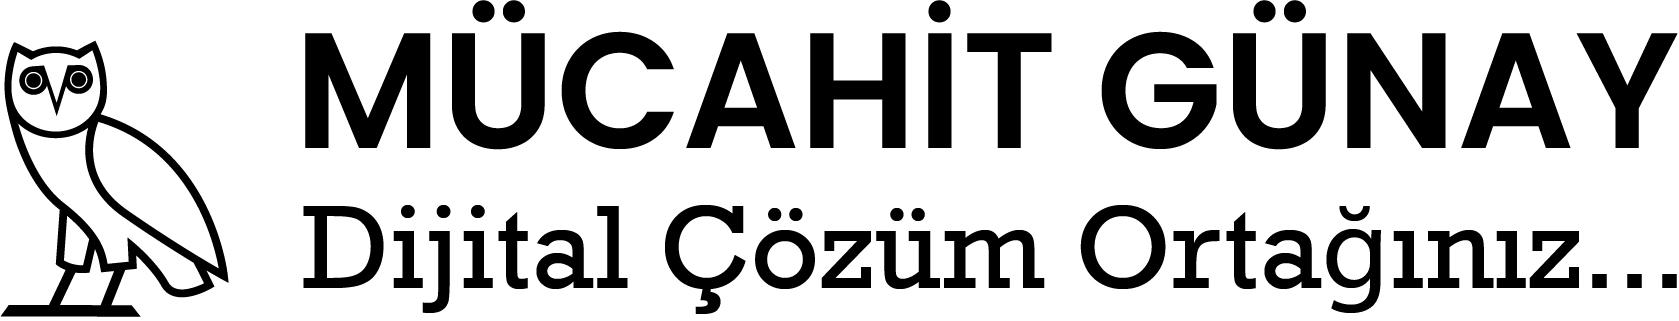 Mücahit Günay | Antalya Web Tasarım, Web Yazılım, Hosting Hizmeti, Sosyal Medya Hizmeti